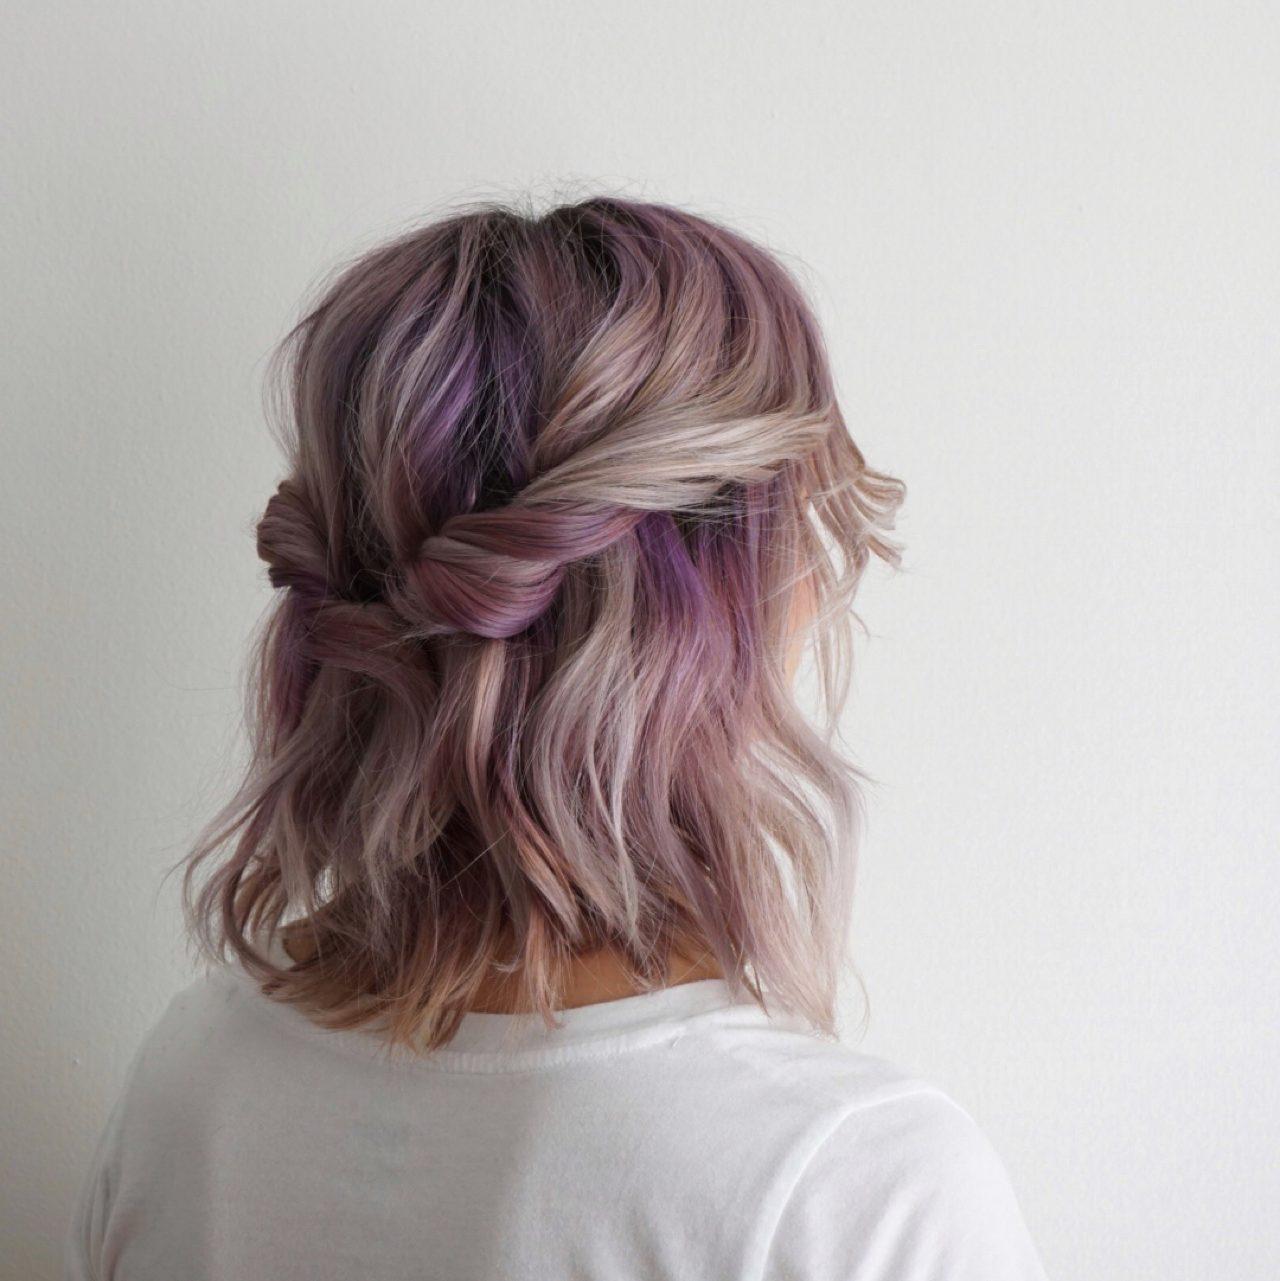 Búi tóc ngắn nửa xoắn